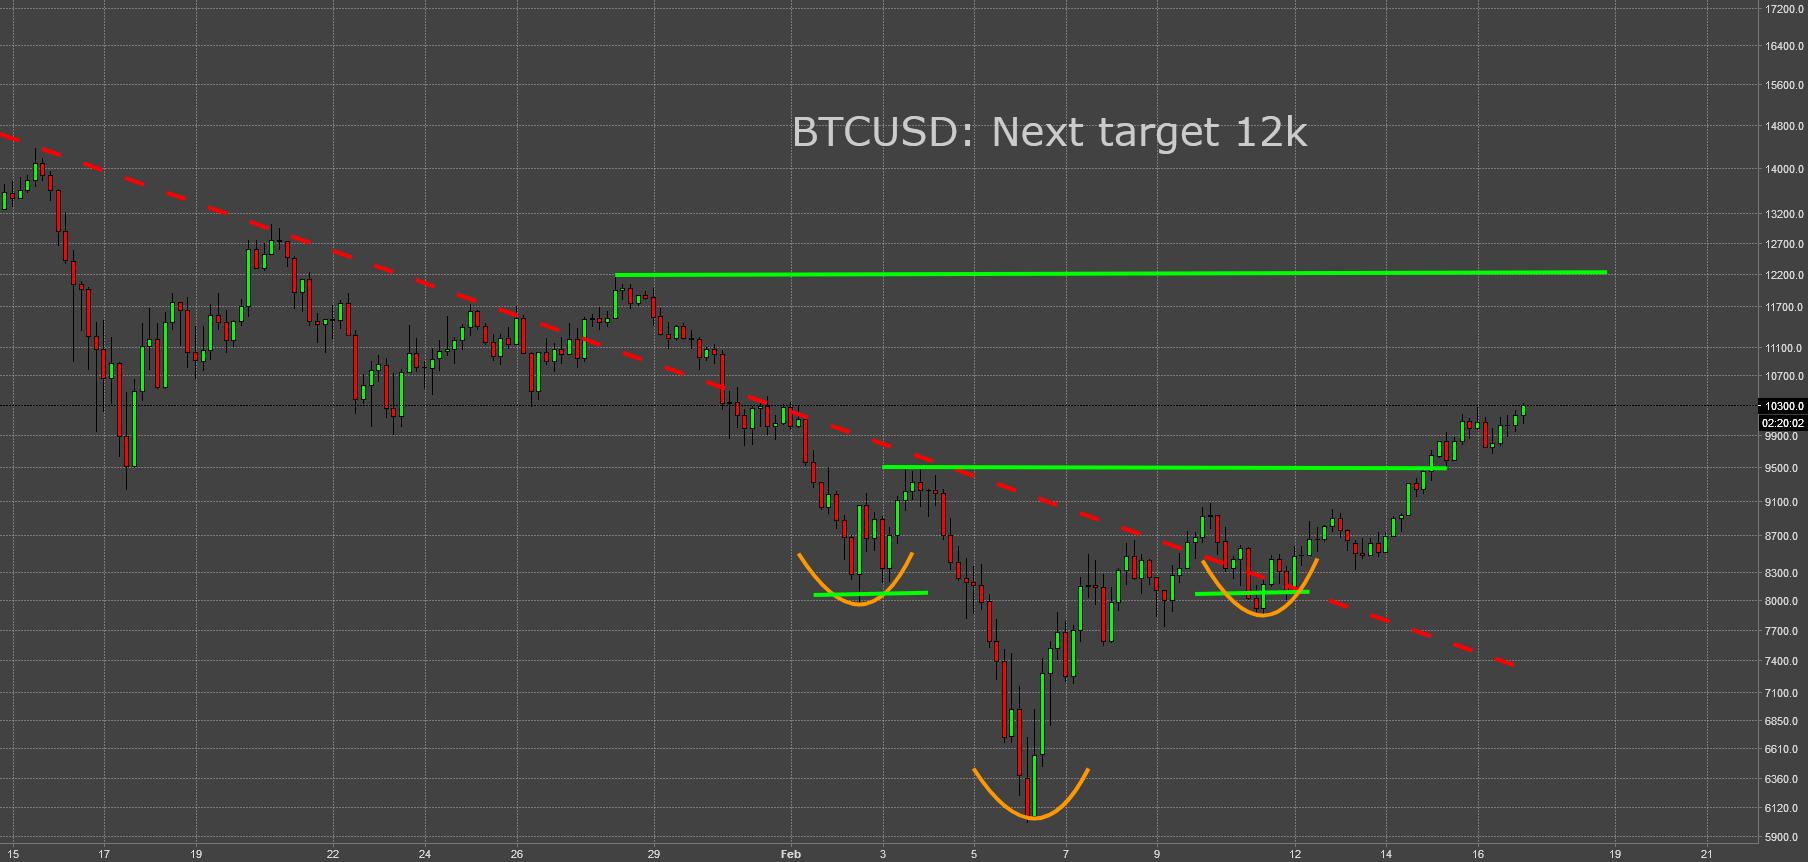 BTCUSD: Next Target 12k